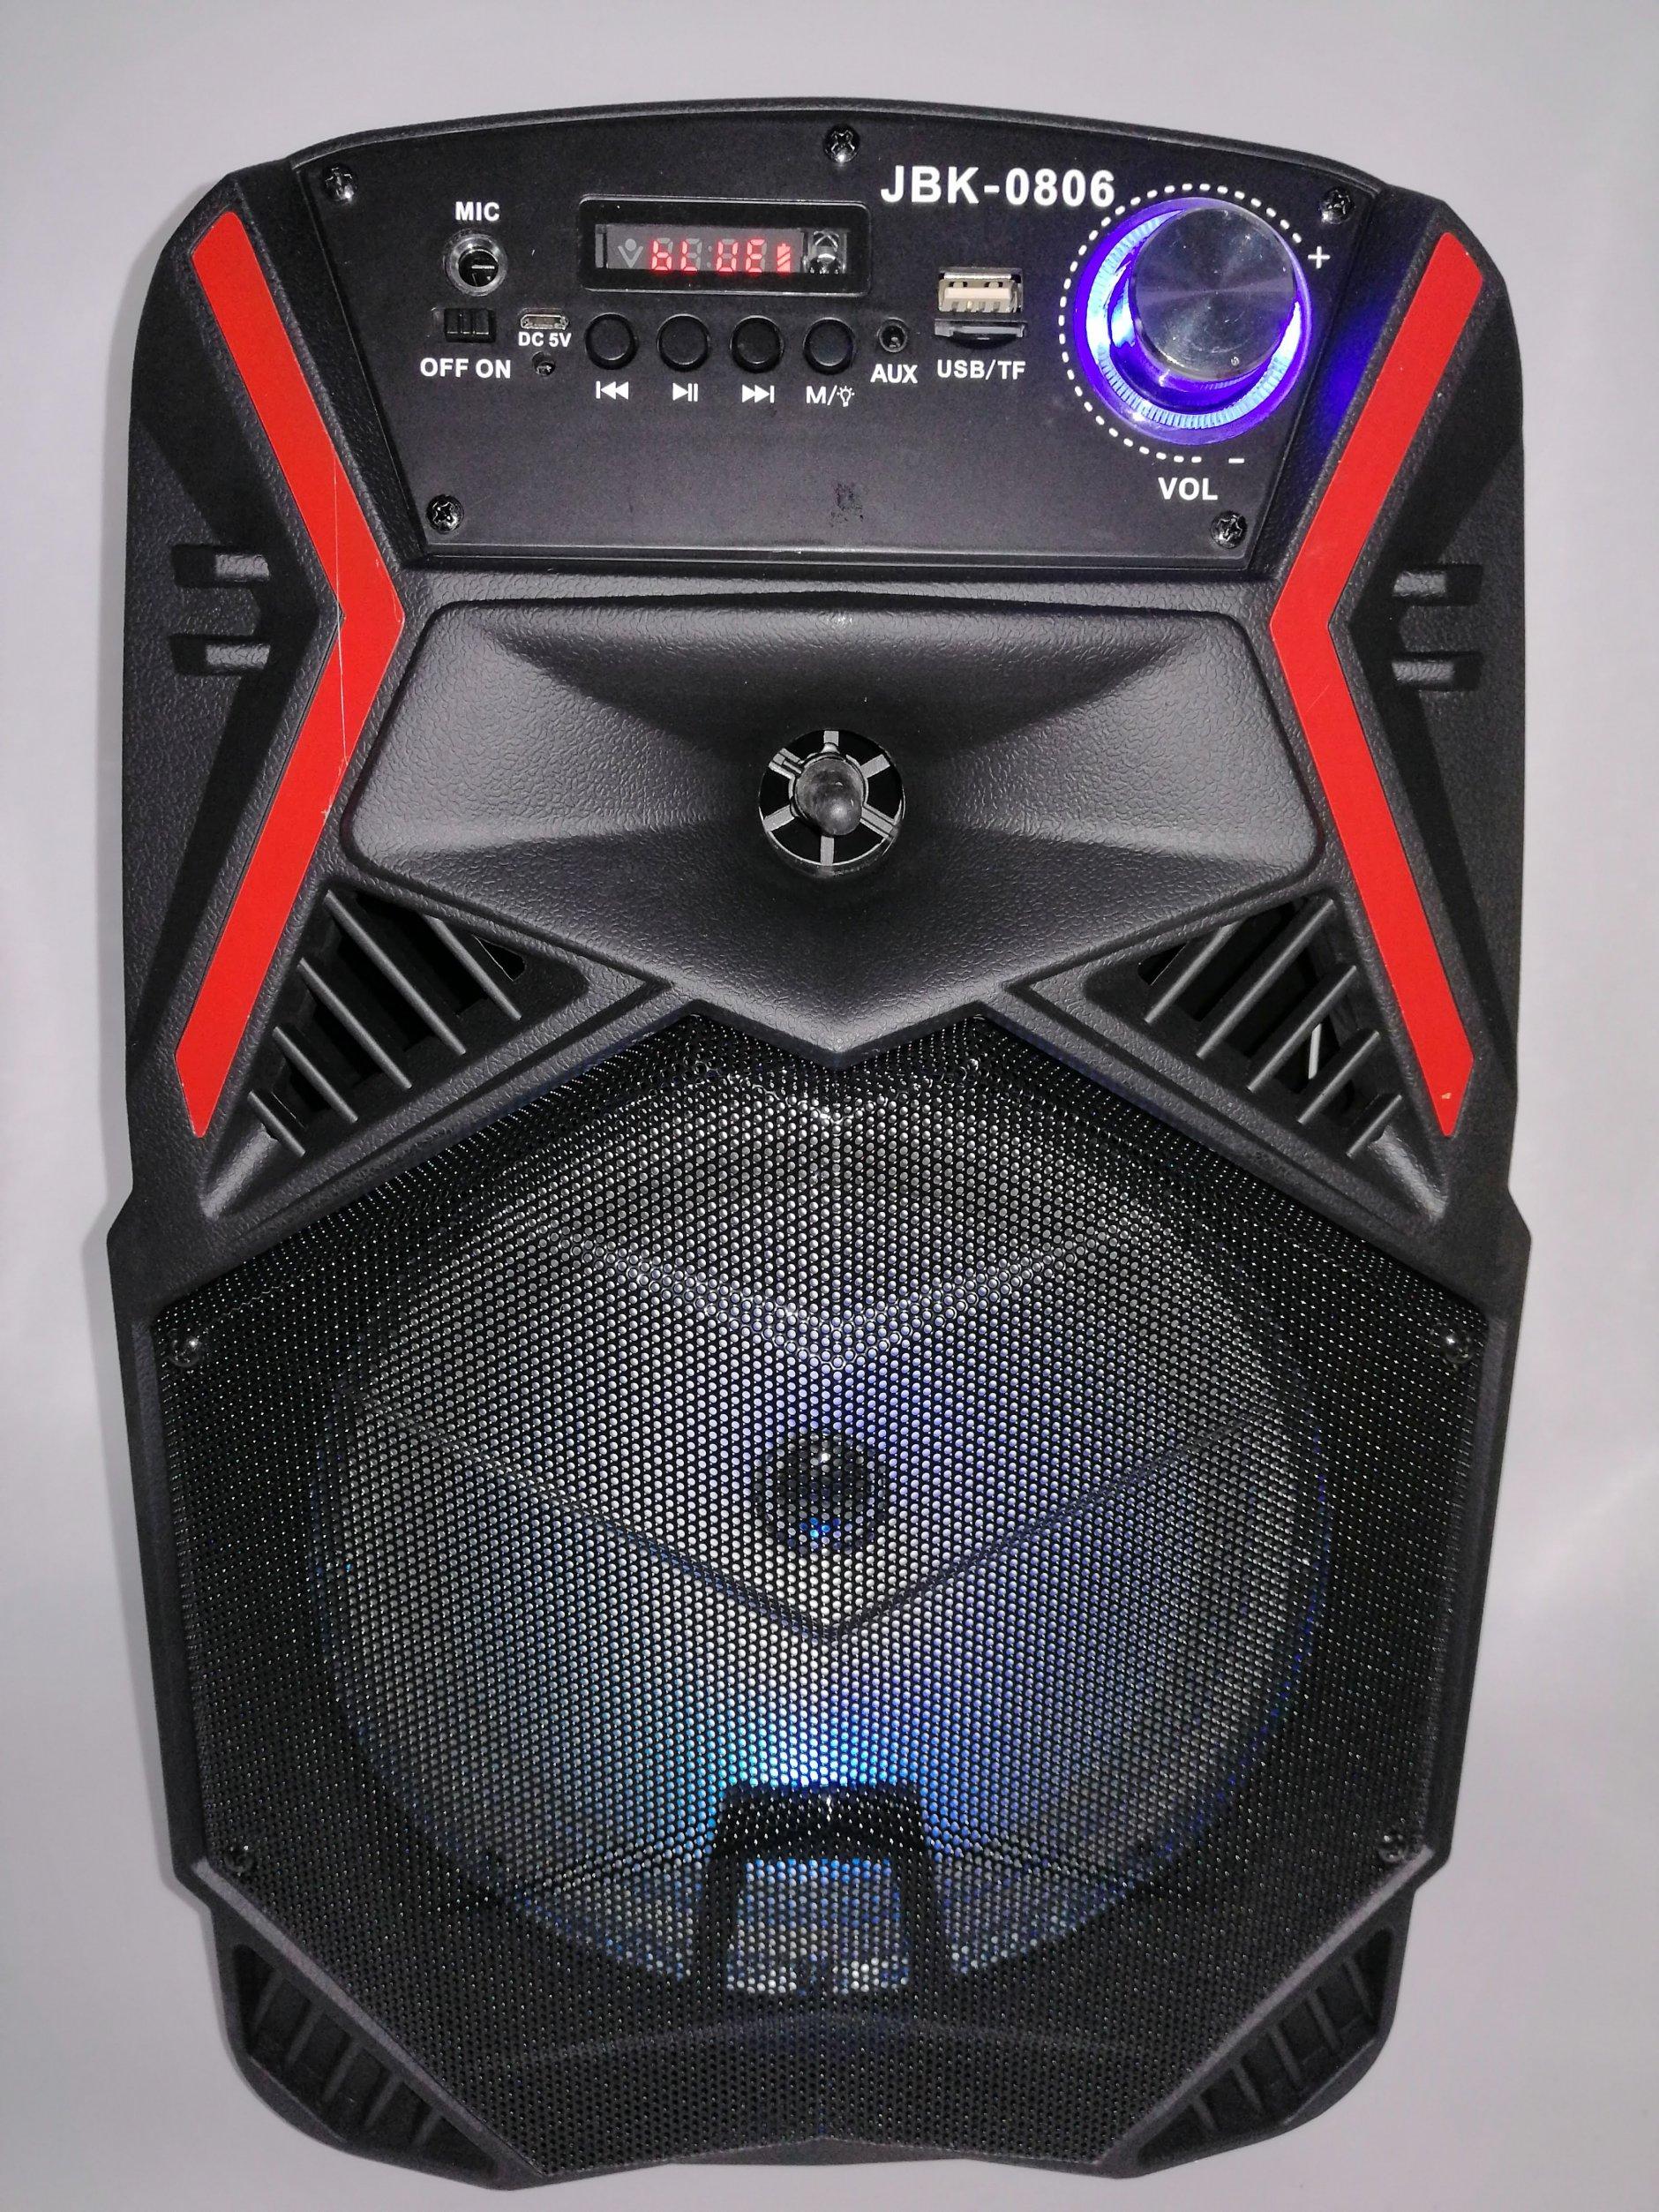 Audio Zvucnik Karaoke Bluetooth Zvucnik Jbk 0806 Novo 21 07 2020